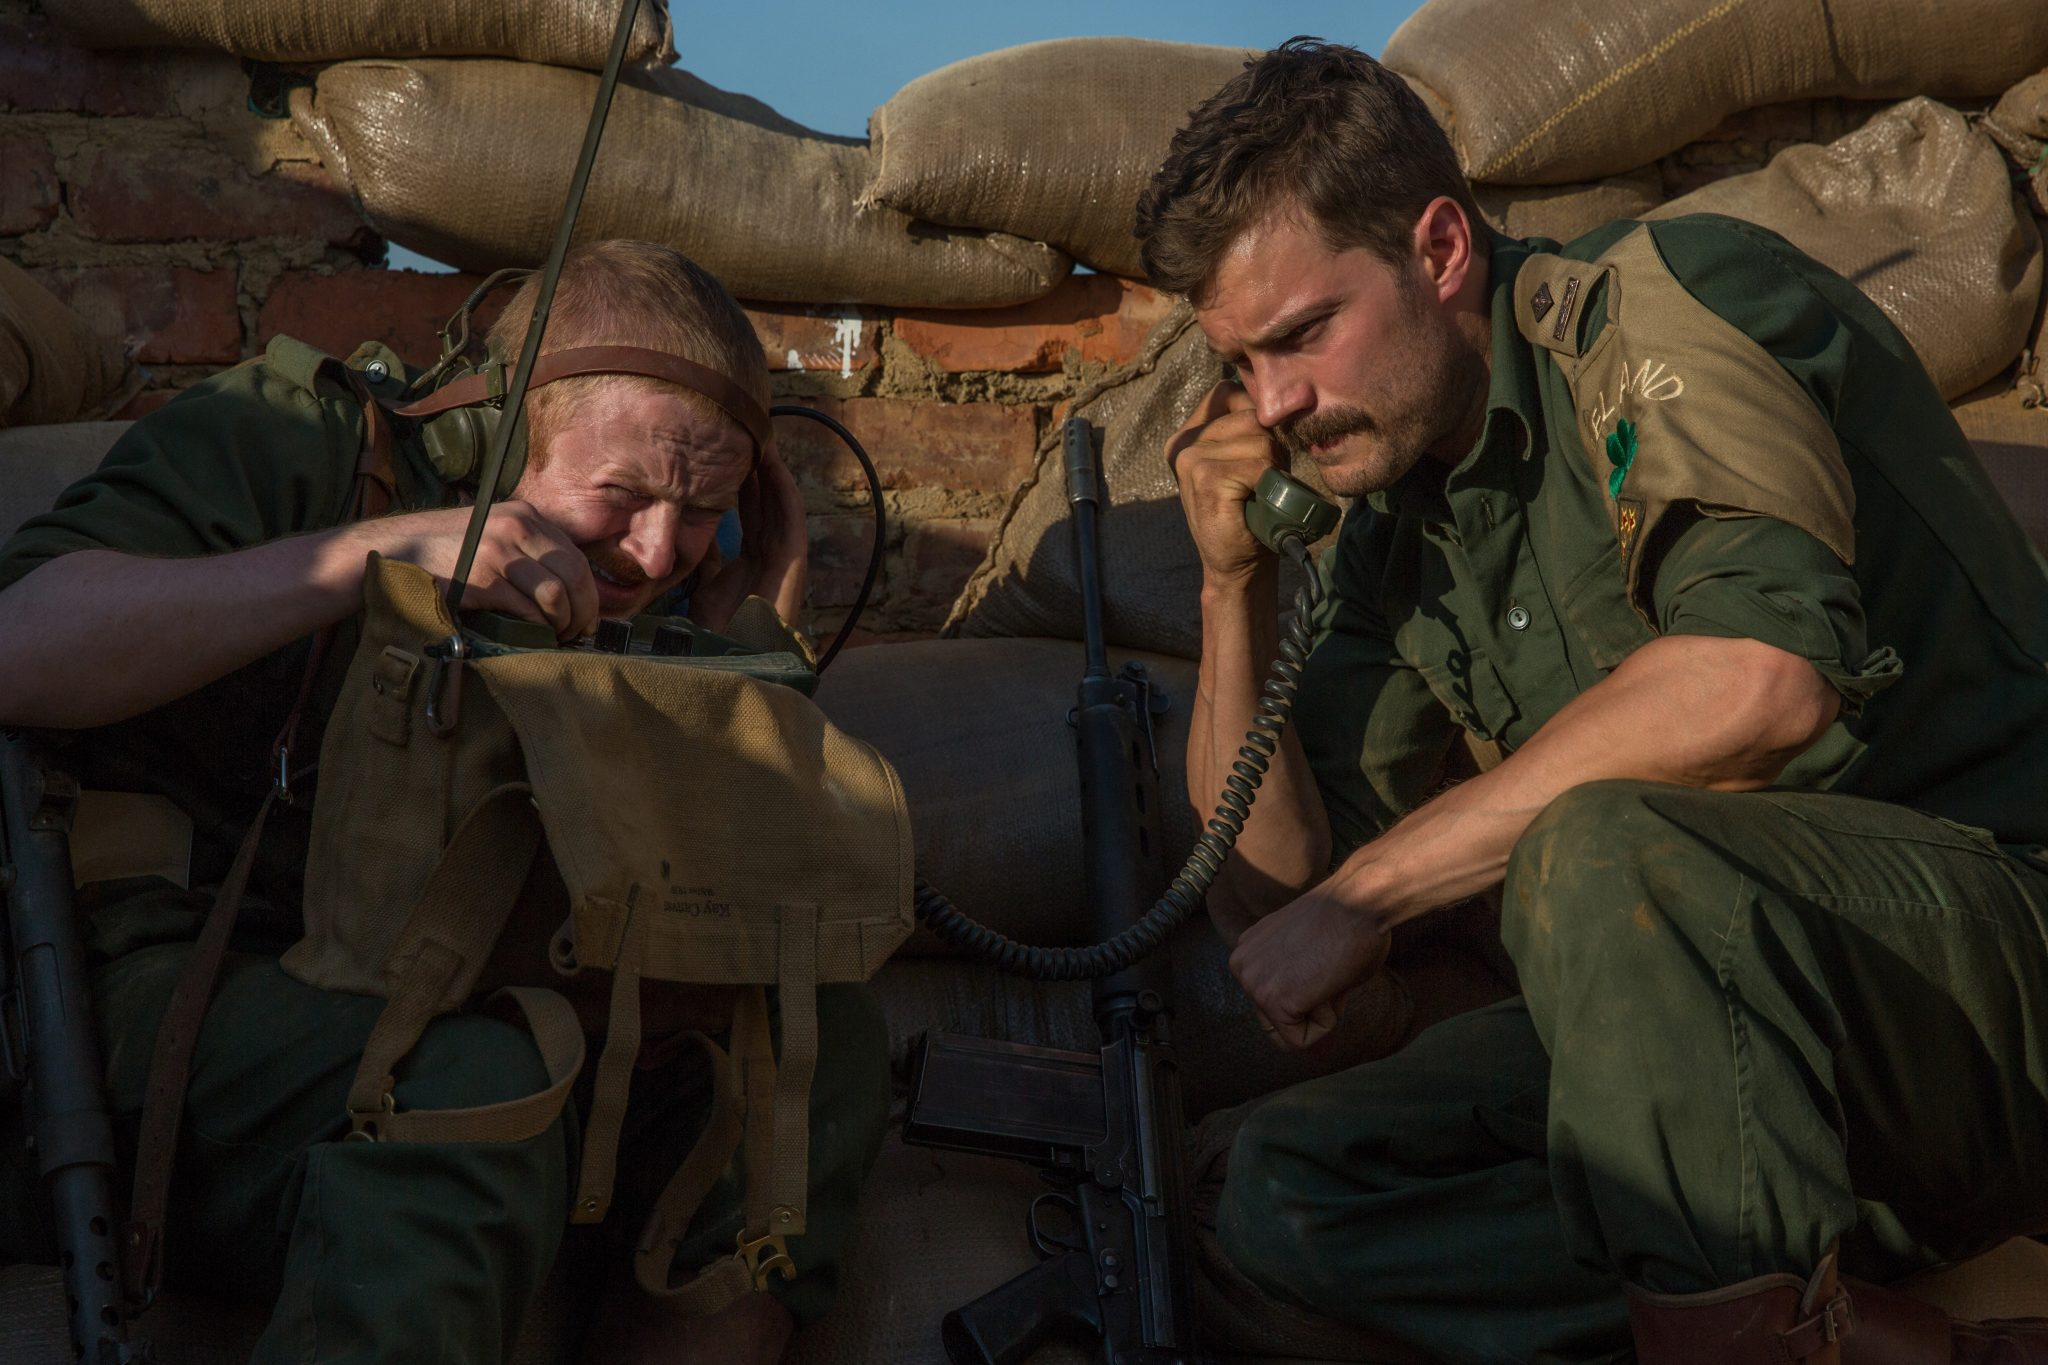 The Siege of Jadotville © Netflix/Parallel Films